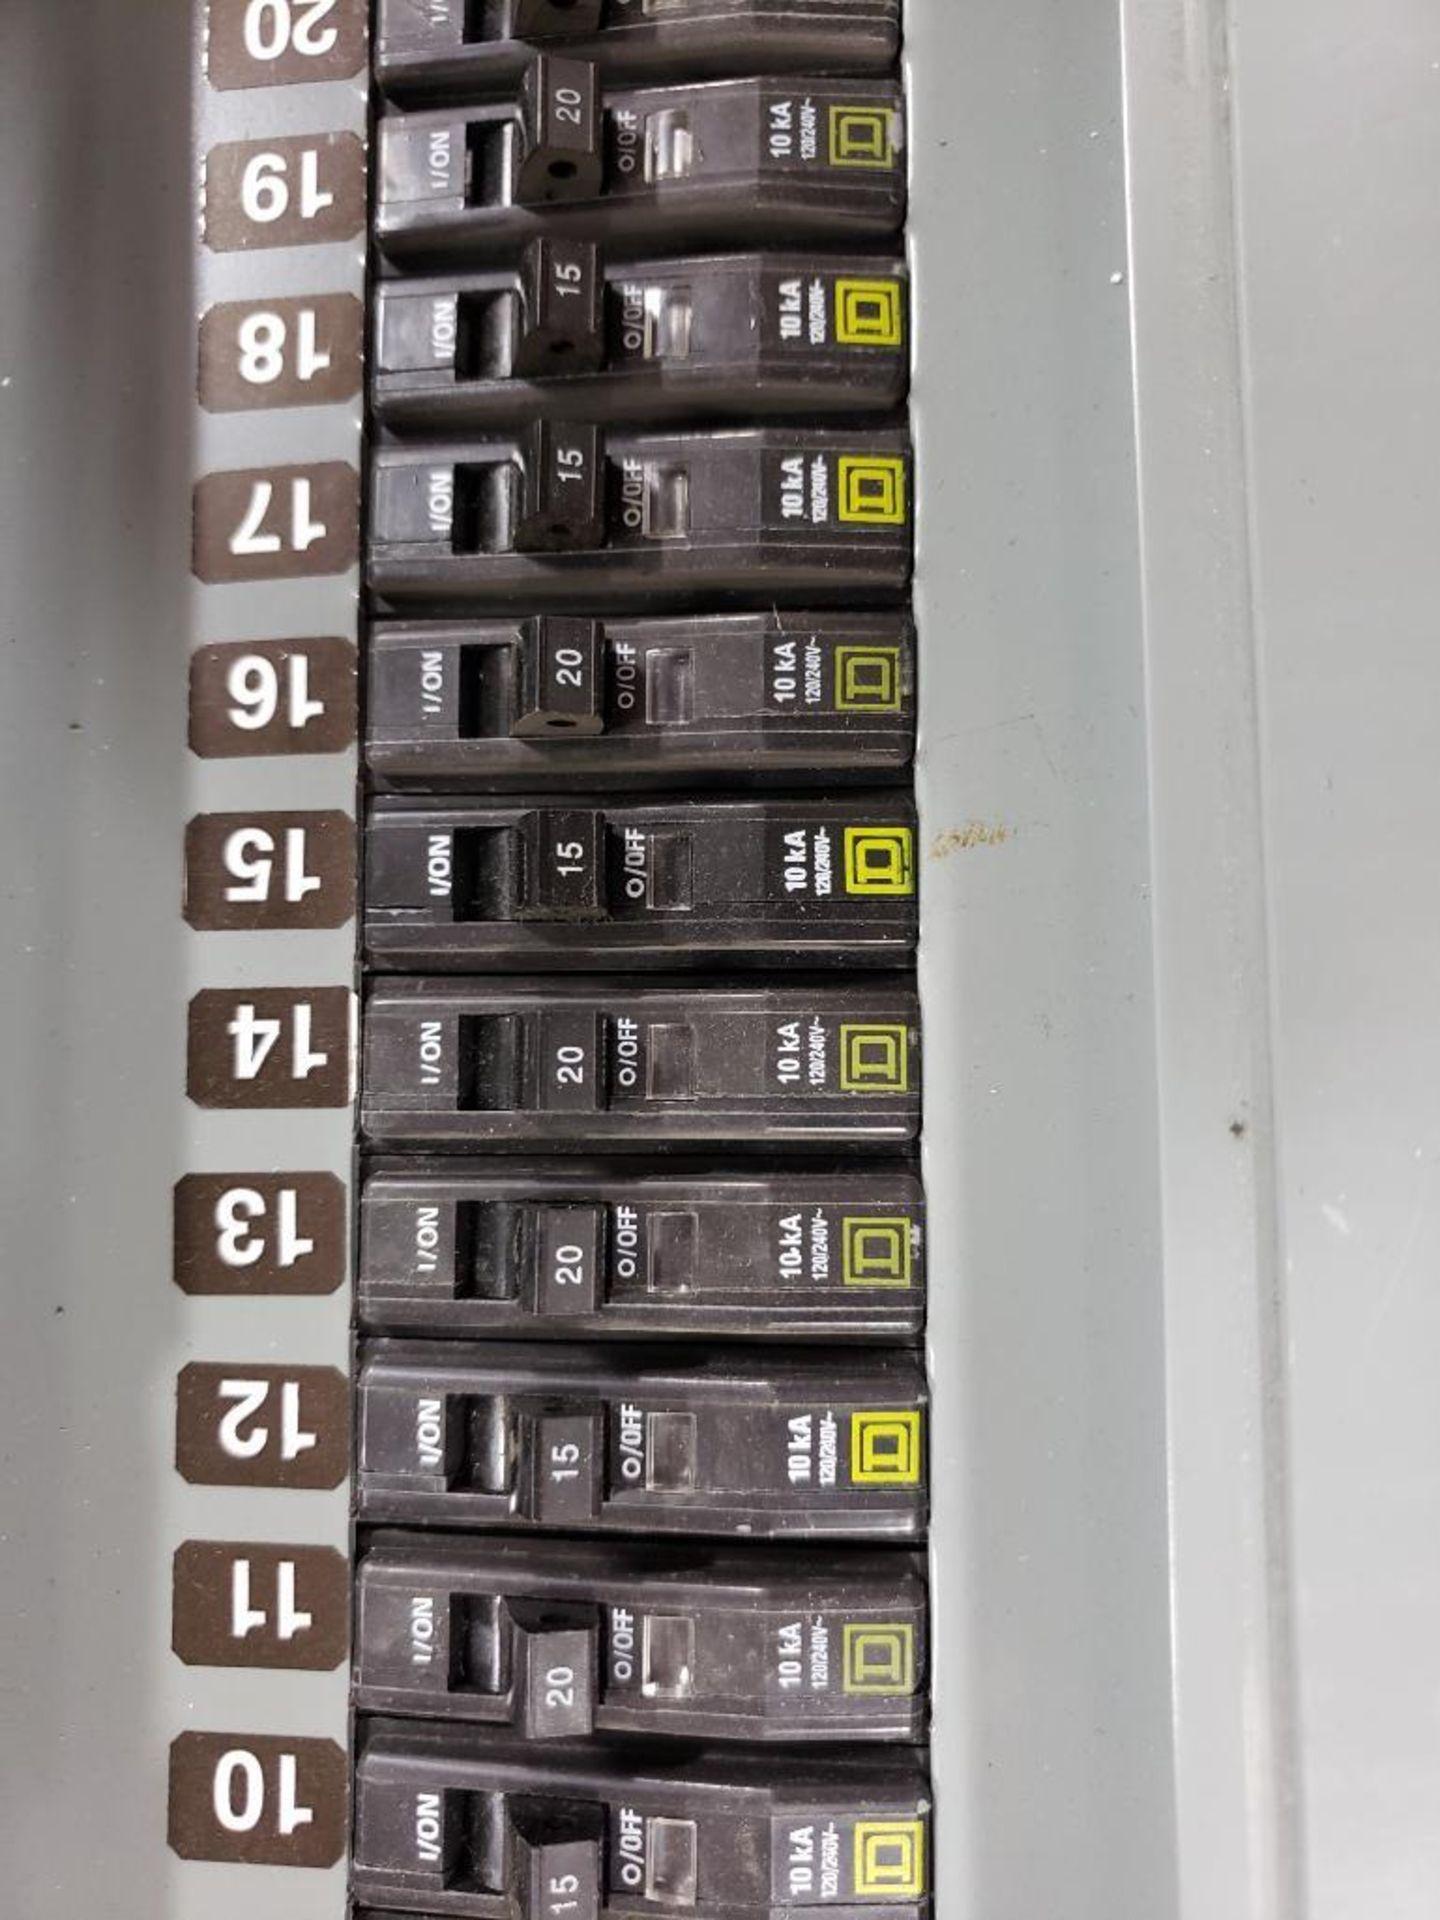 Square-D LX62TS Type-1 Enclosure. - Image 5 of 11